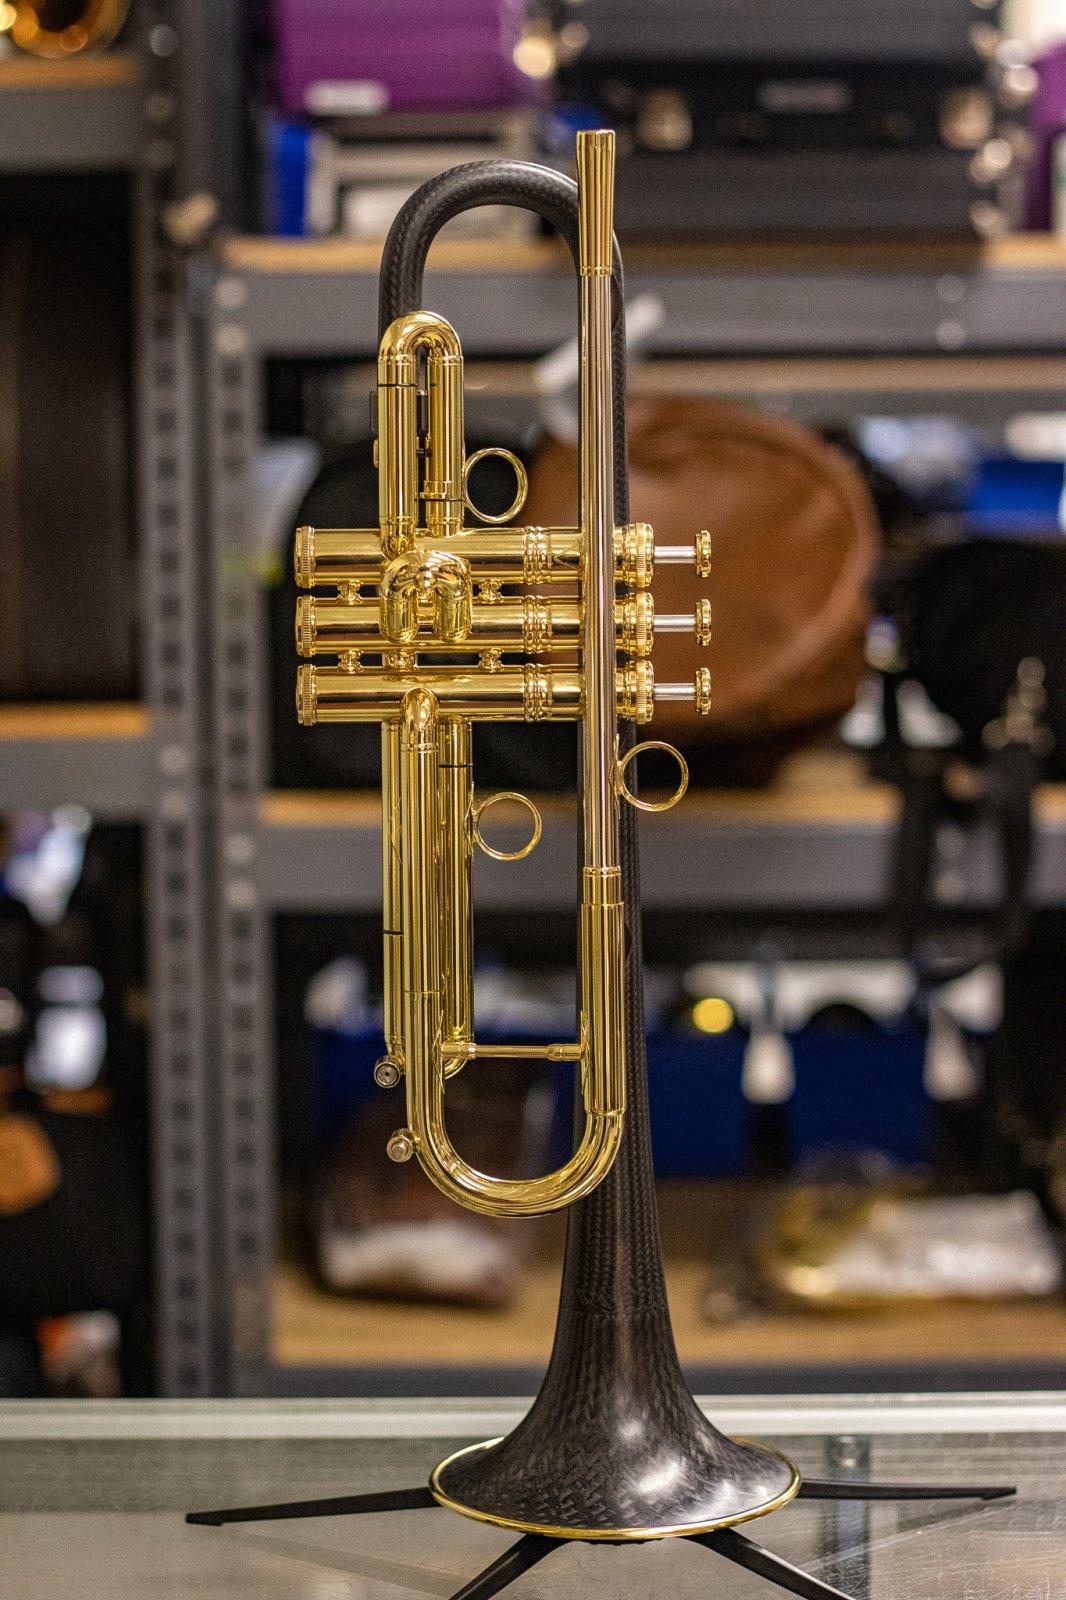 daCarbo - TML Trumpet